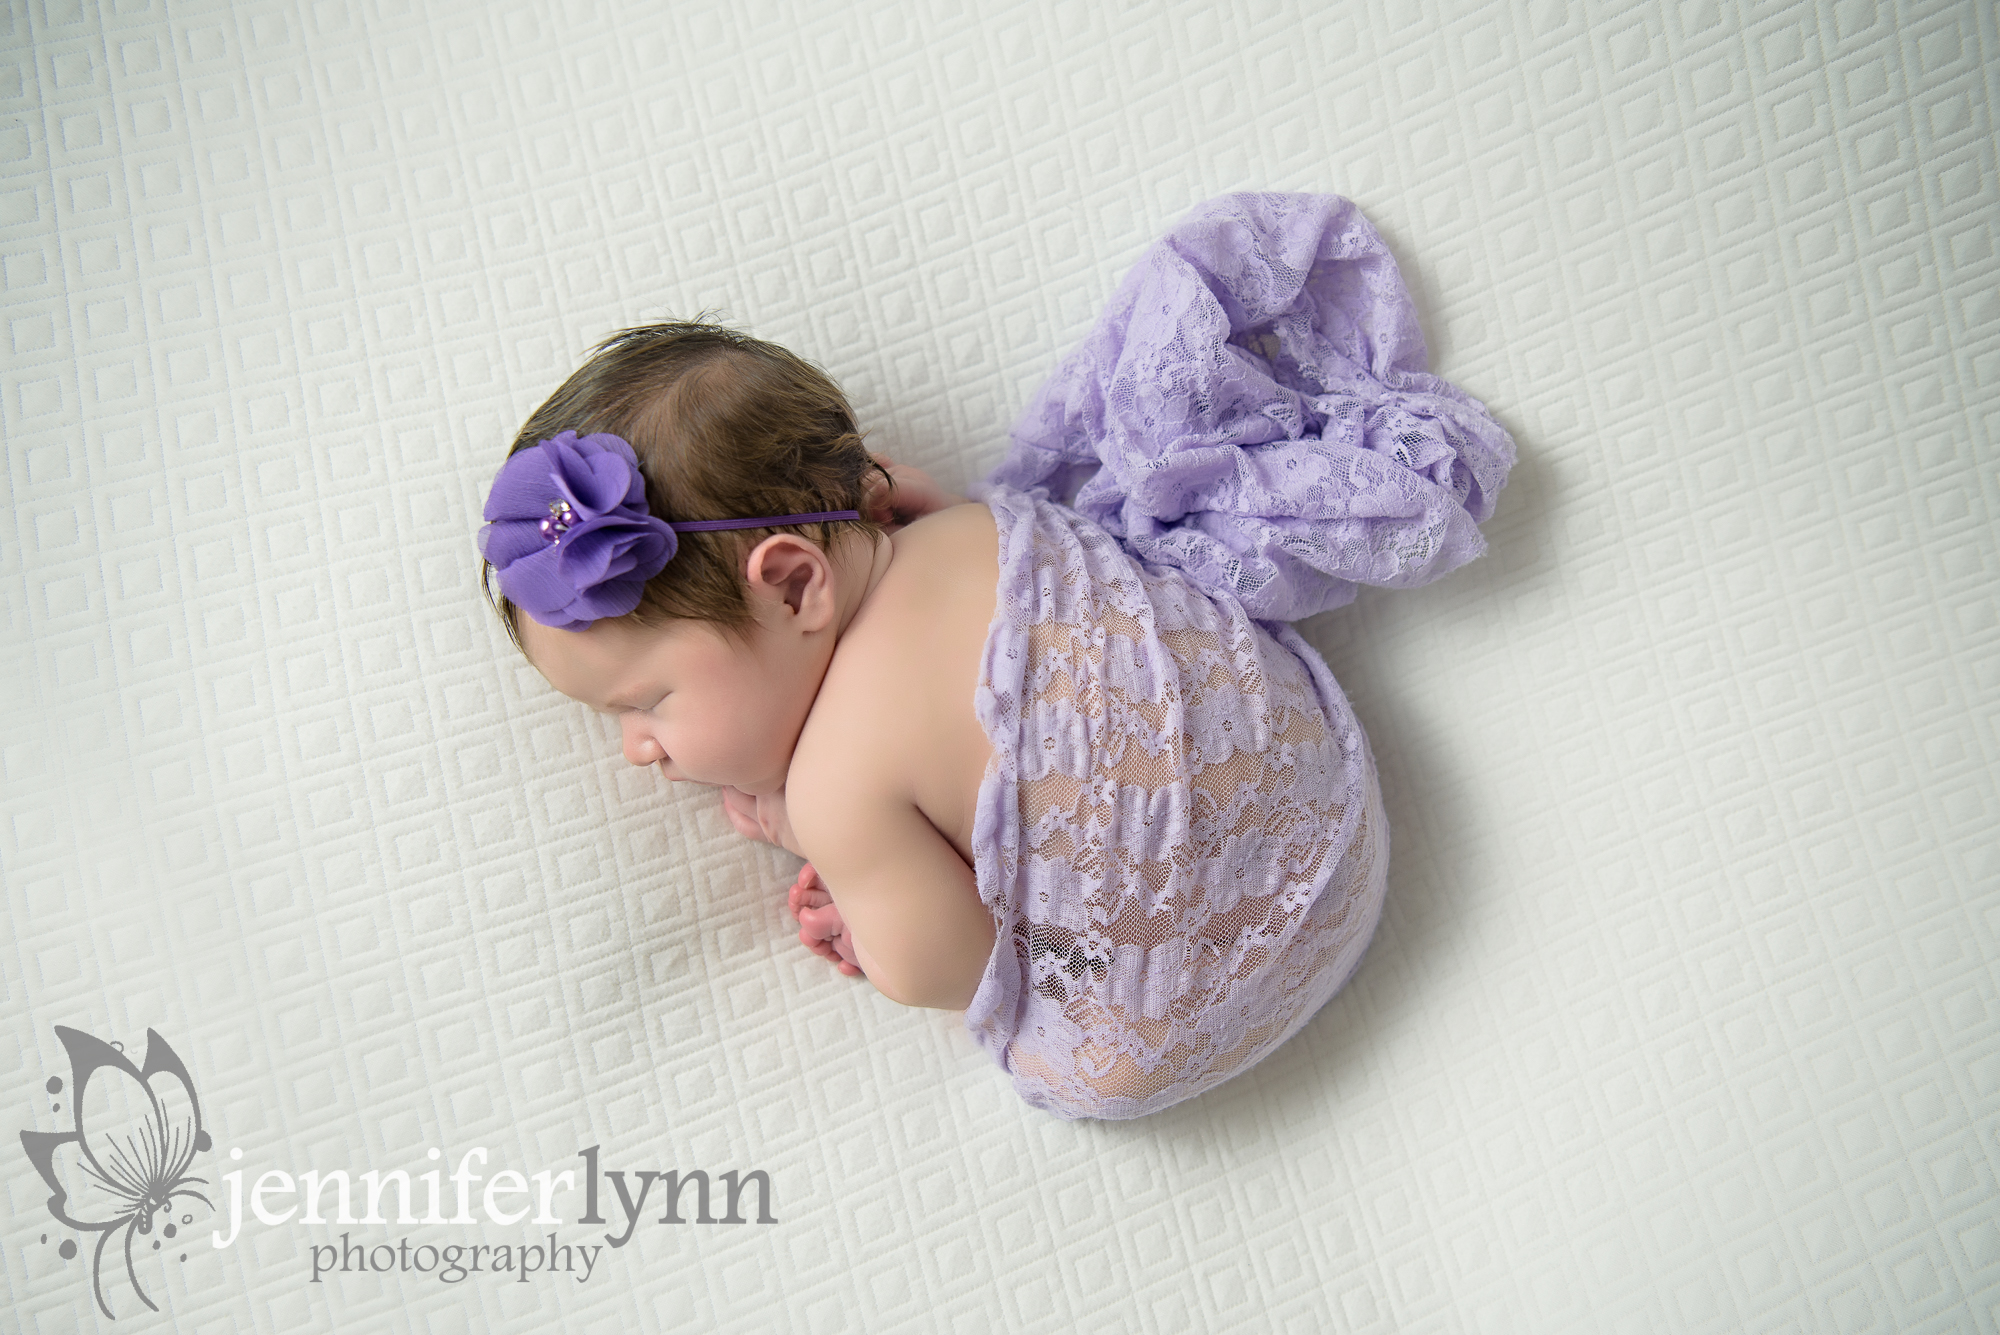 Newborn Girl Overhead Purple Lace White Blanket